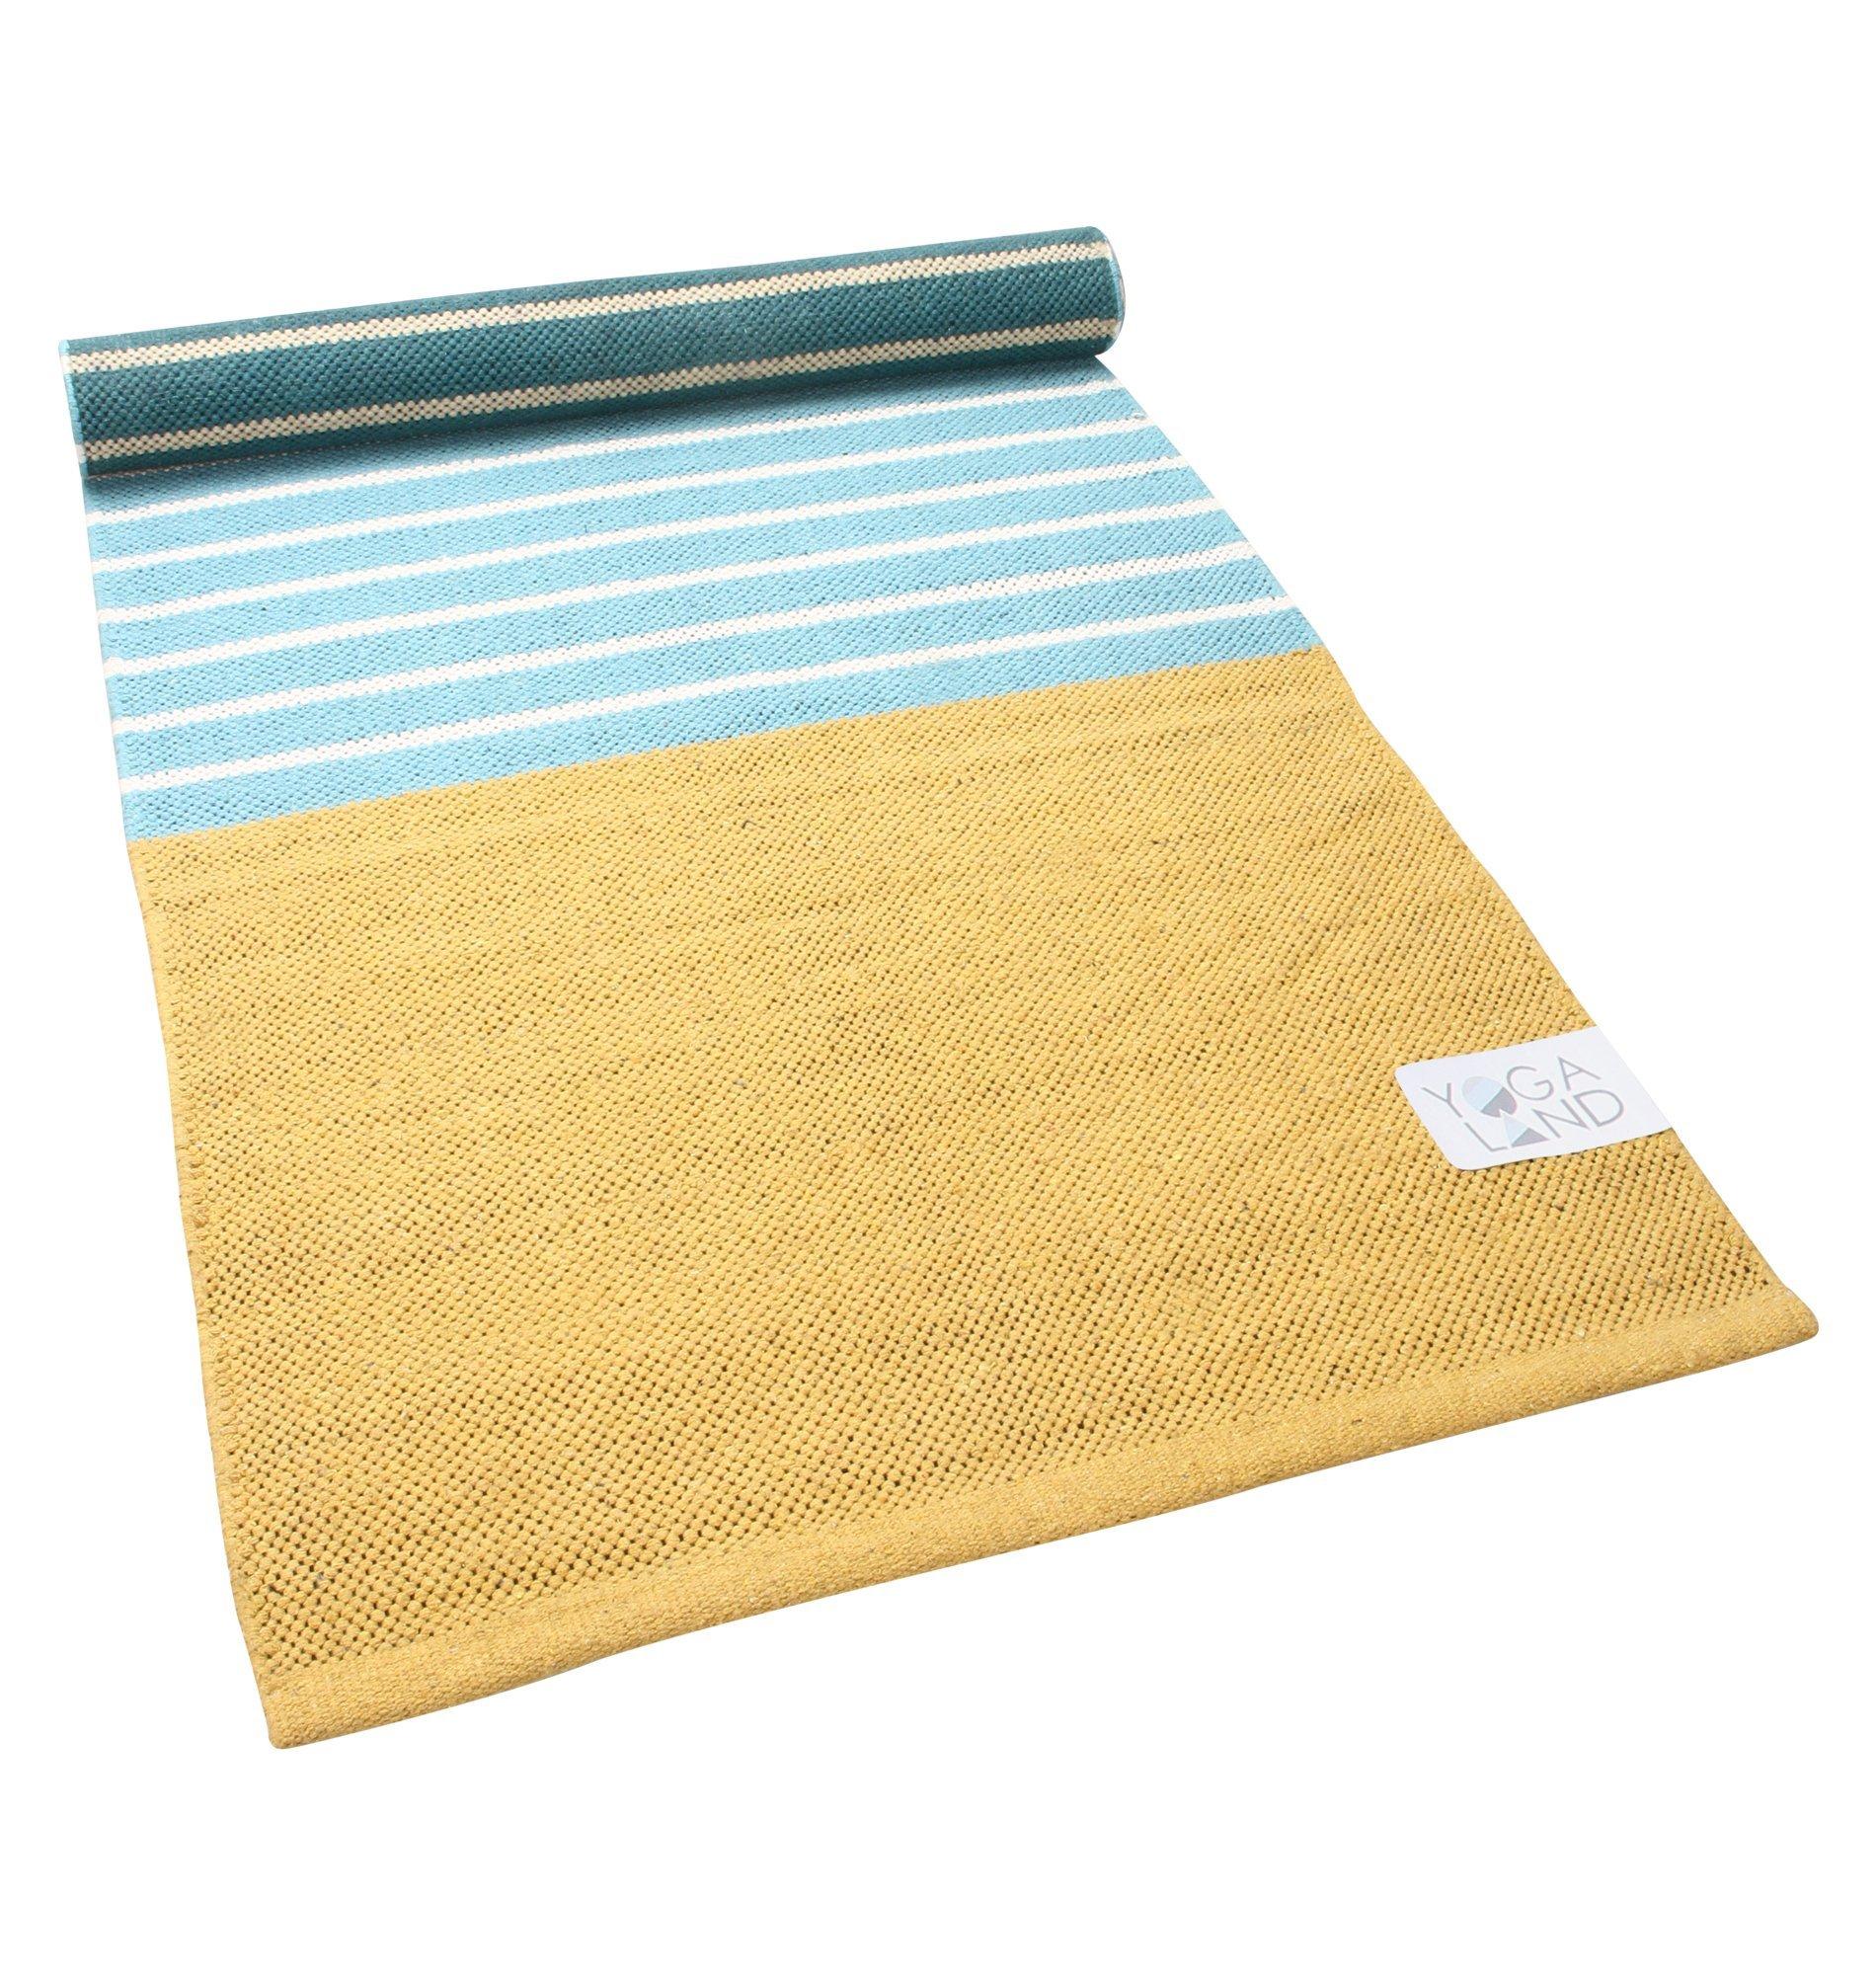 Yoga Land Organic Bamboo Yoga Mat – Natural Non-Toxic Eco-Friendly Cotton Bag to Carry – Anti-Slip – Anti-Bacterial Mat - Guru Bamboo (6 mm, 25''X 72'')